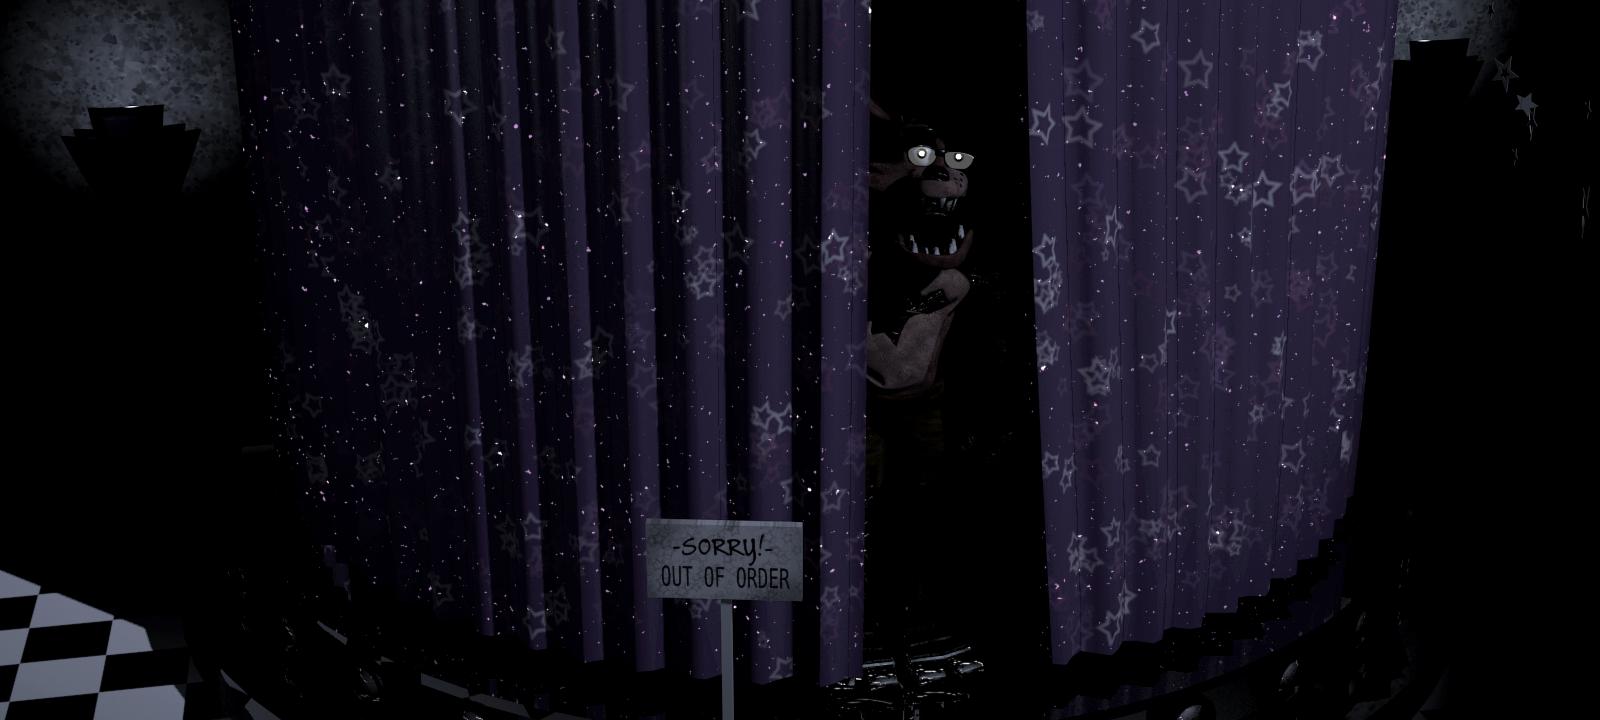 Open black curtain - Qbjasc2